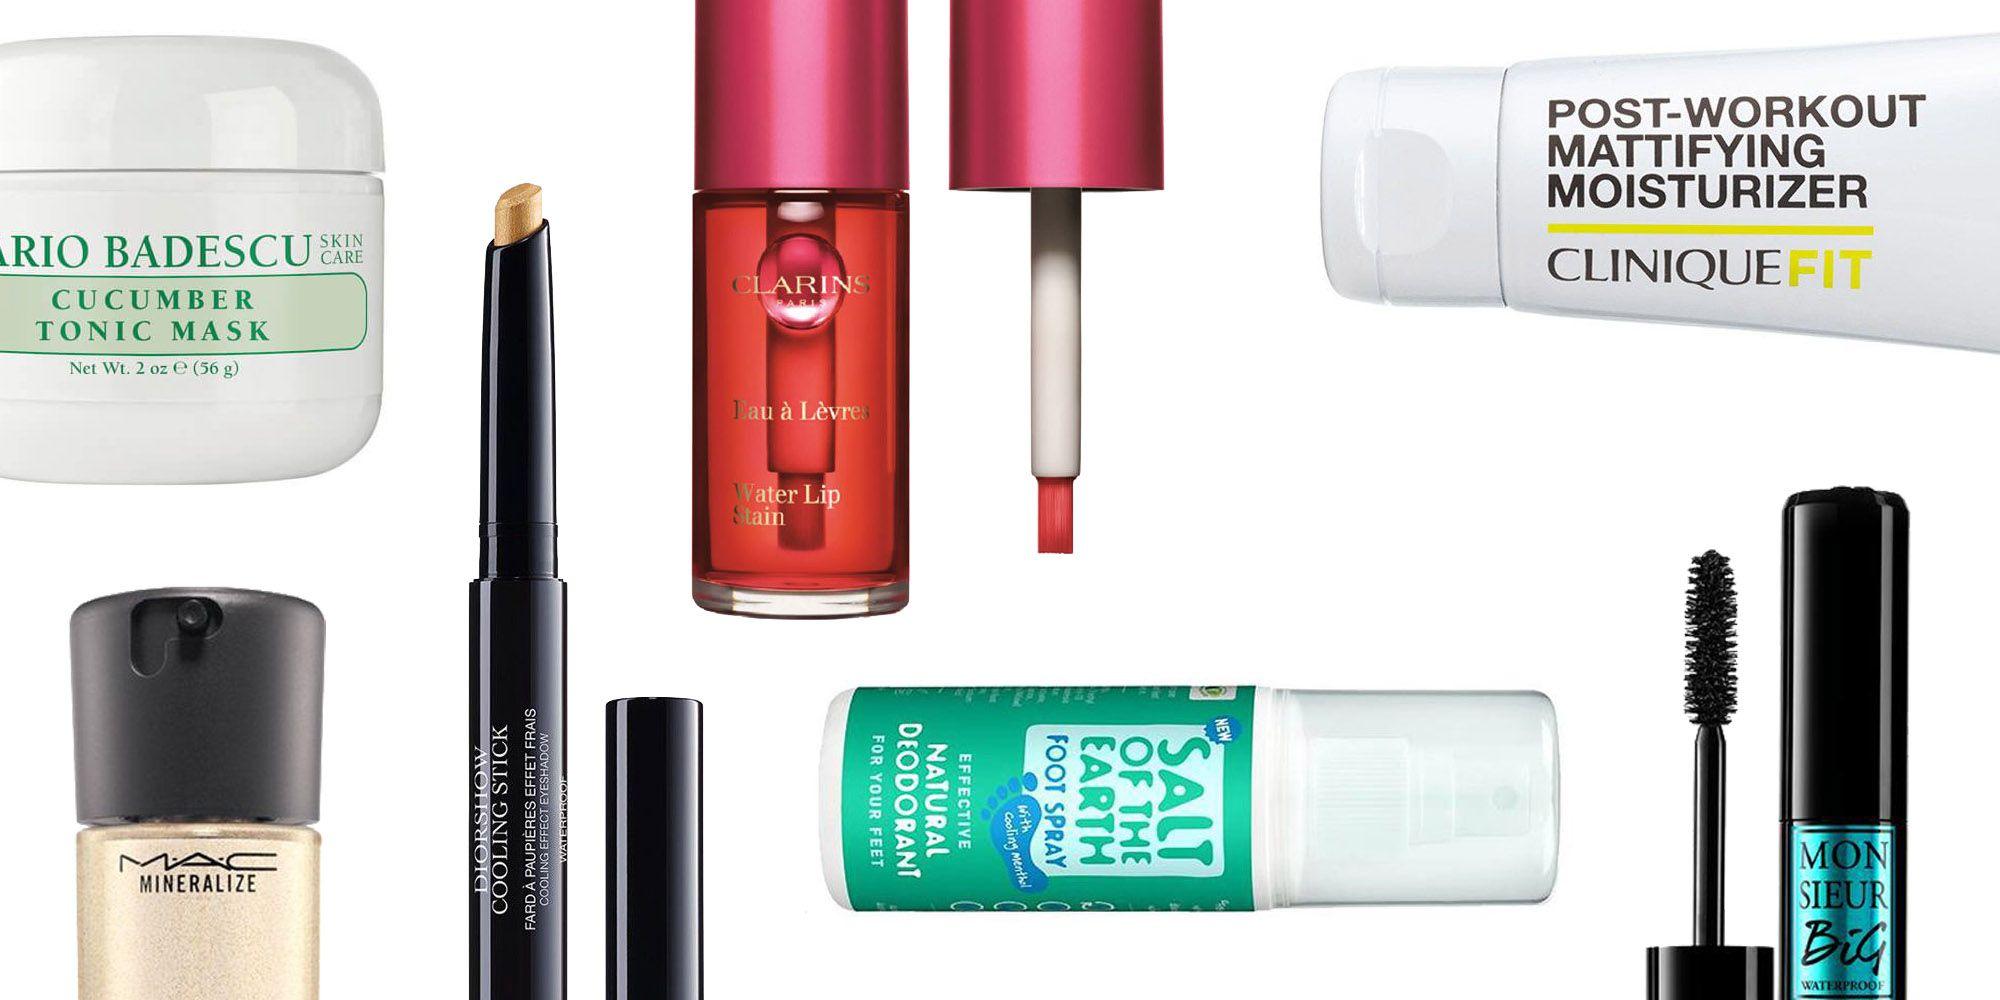 Beauty hitteplan, voetendeo, post workout moisturizer